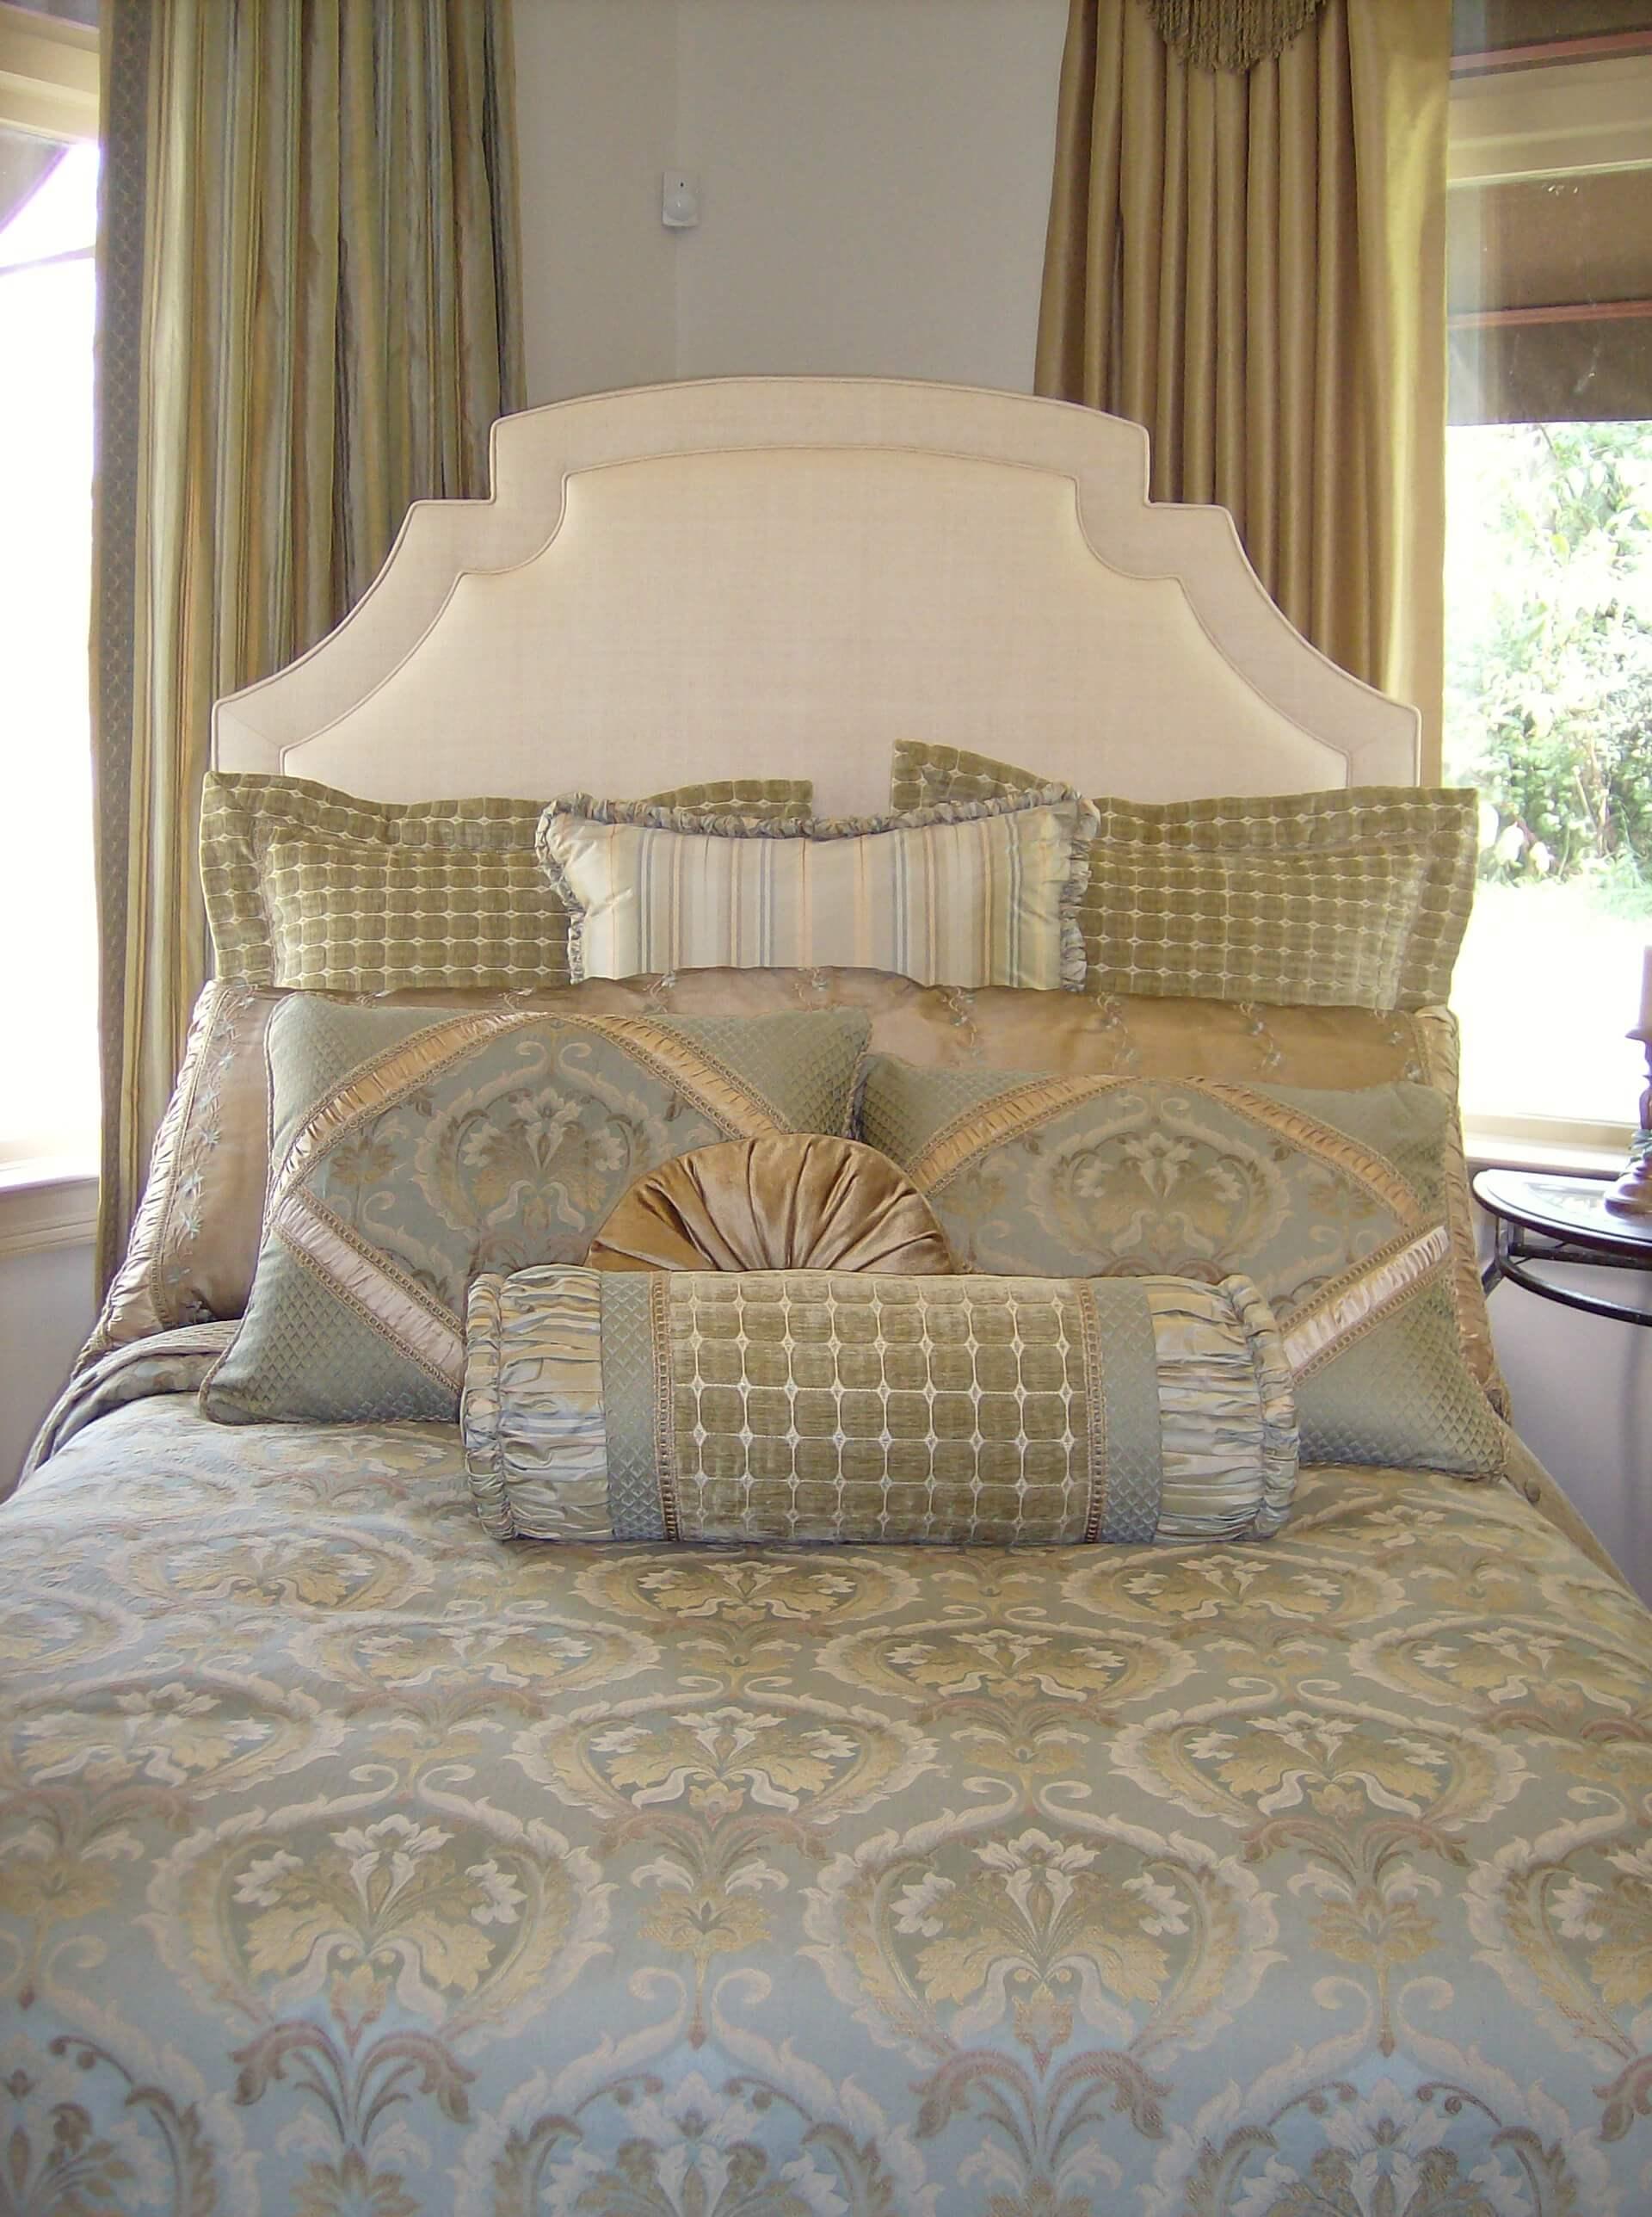 custom-bedding-linens-fabric-atlanta-georgia-2.JPG